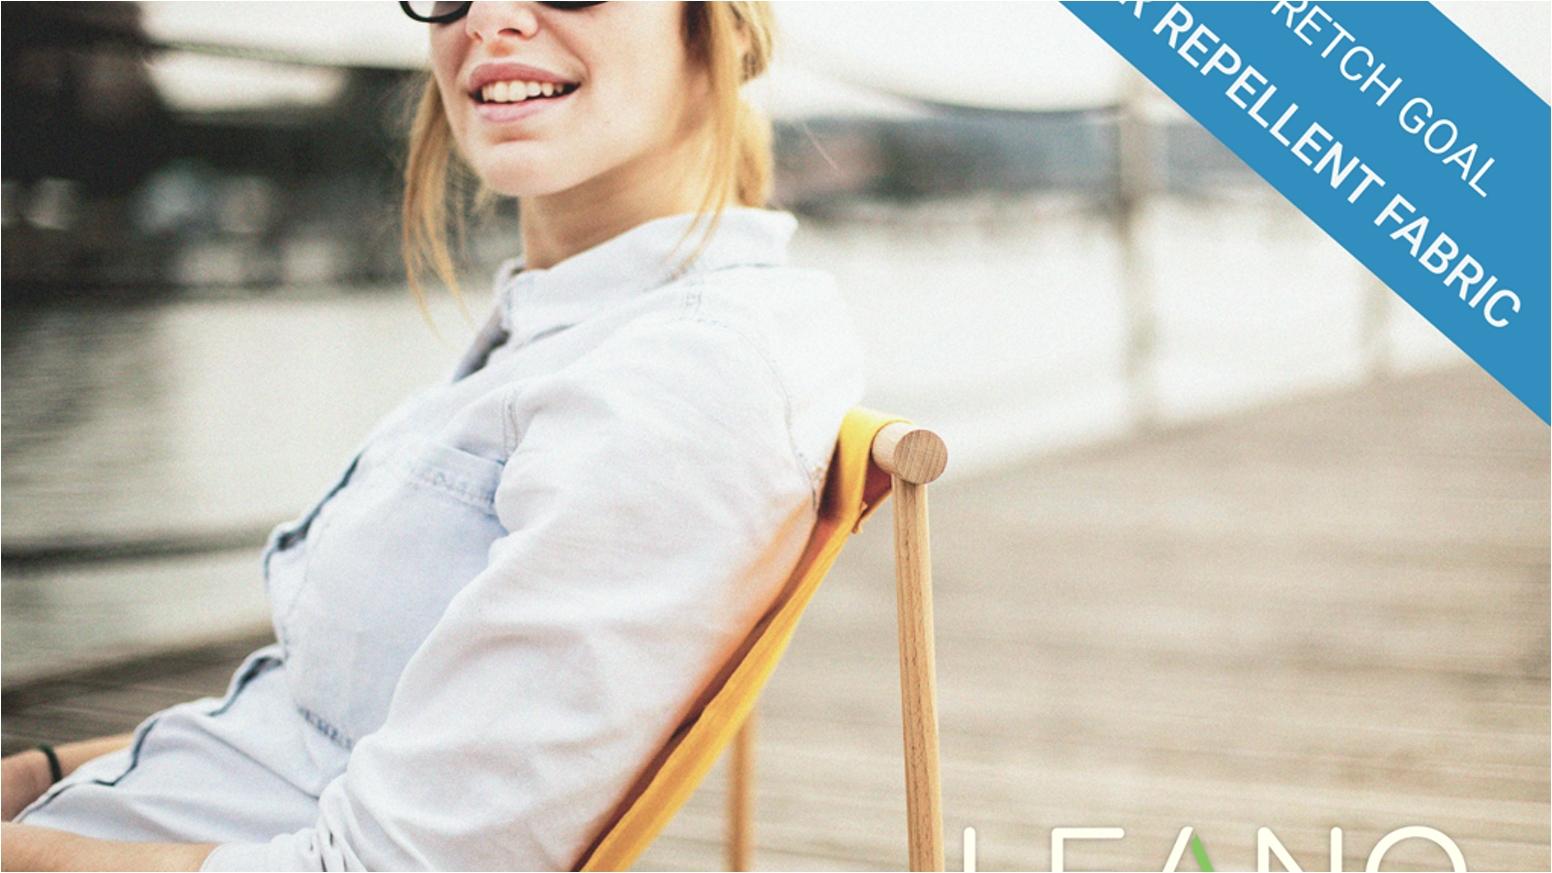 Fidget Chair Kickstarter Leano A Have A Chair Everywhere by Nik Kickstarter